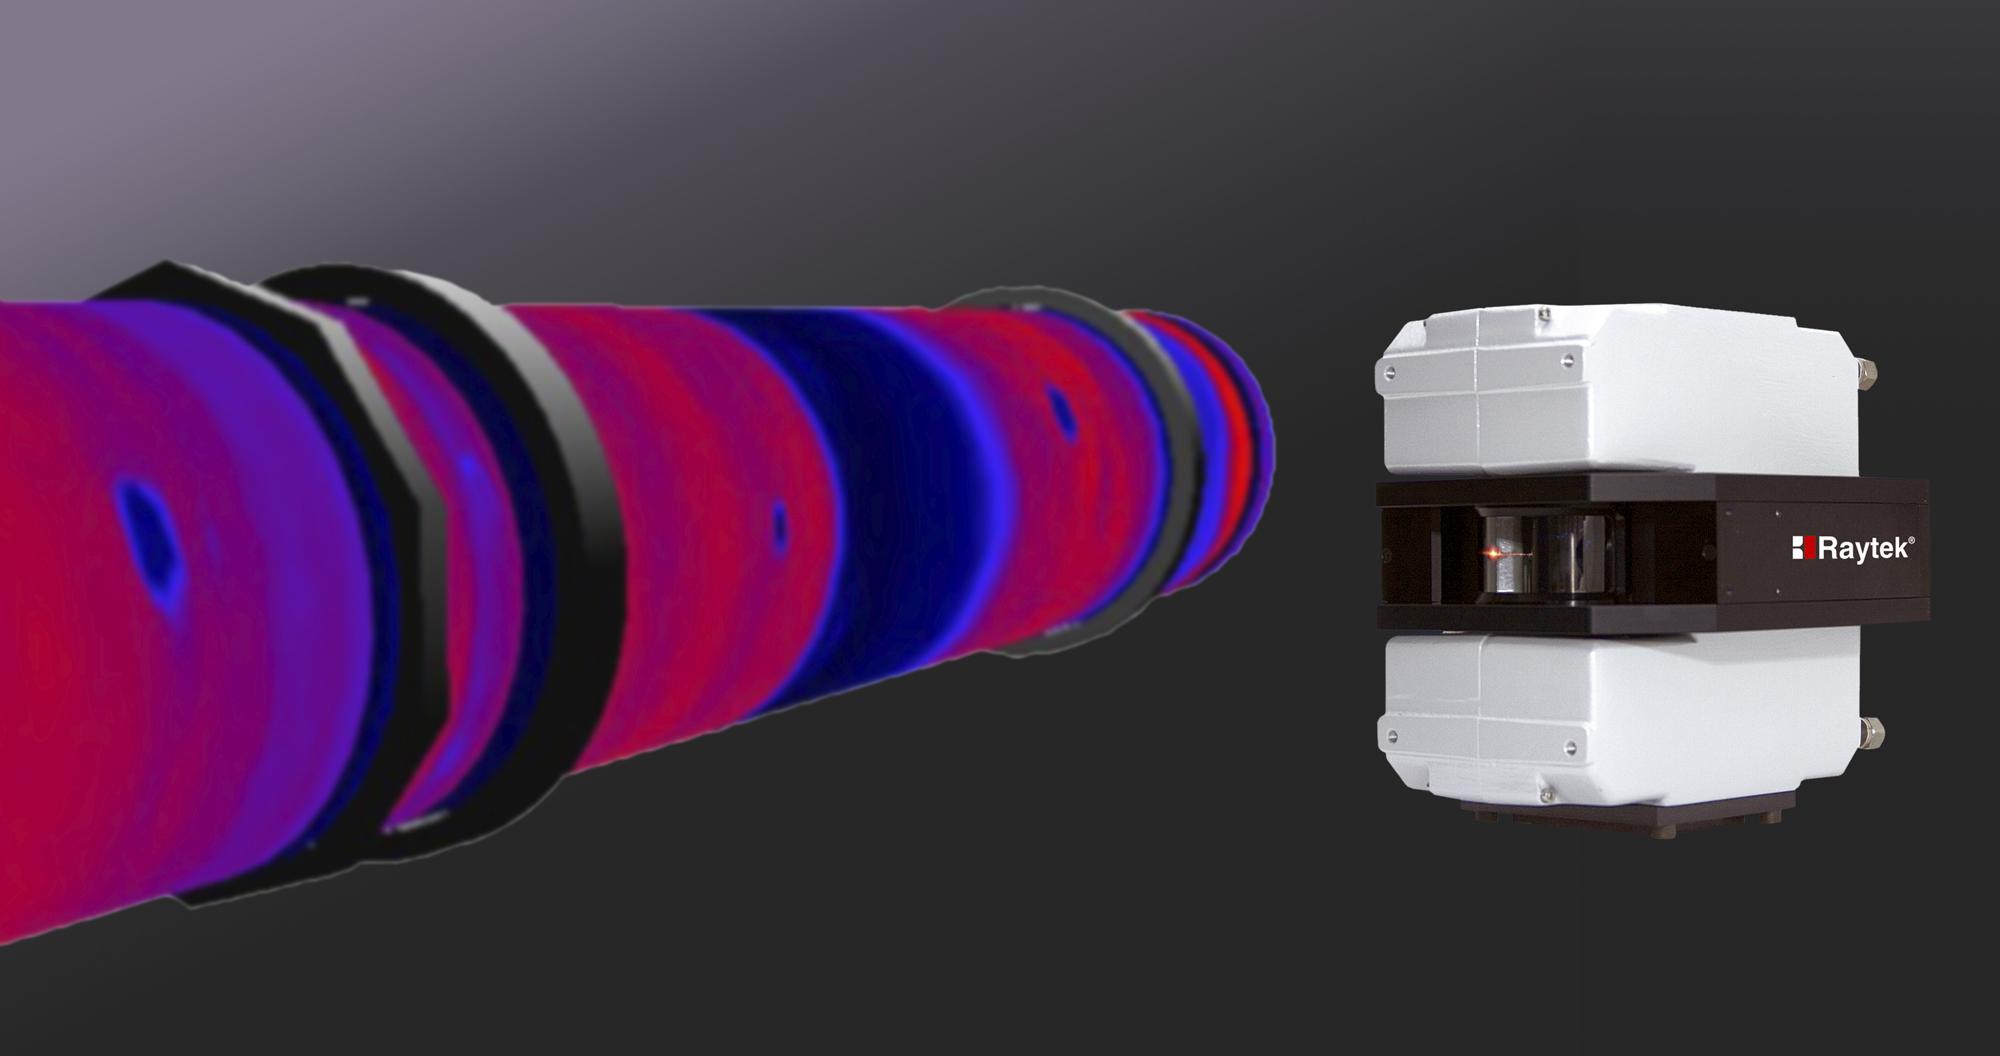 Fluke Raytek CS210 o cómo medir la temperatura de residuos peligrosos